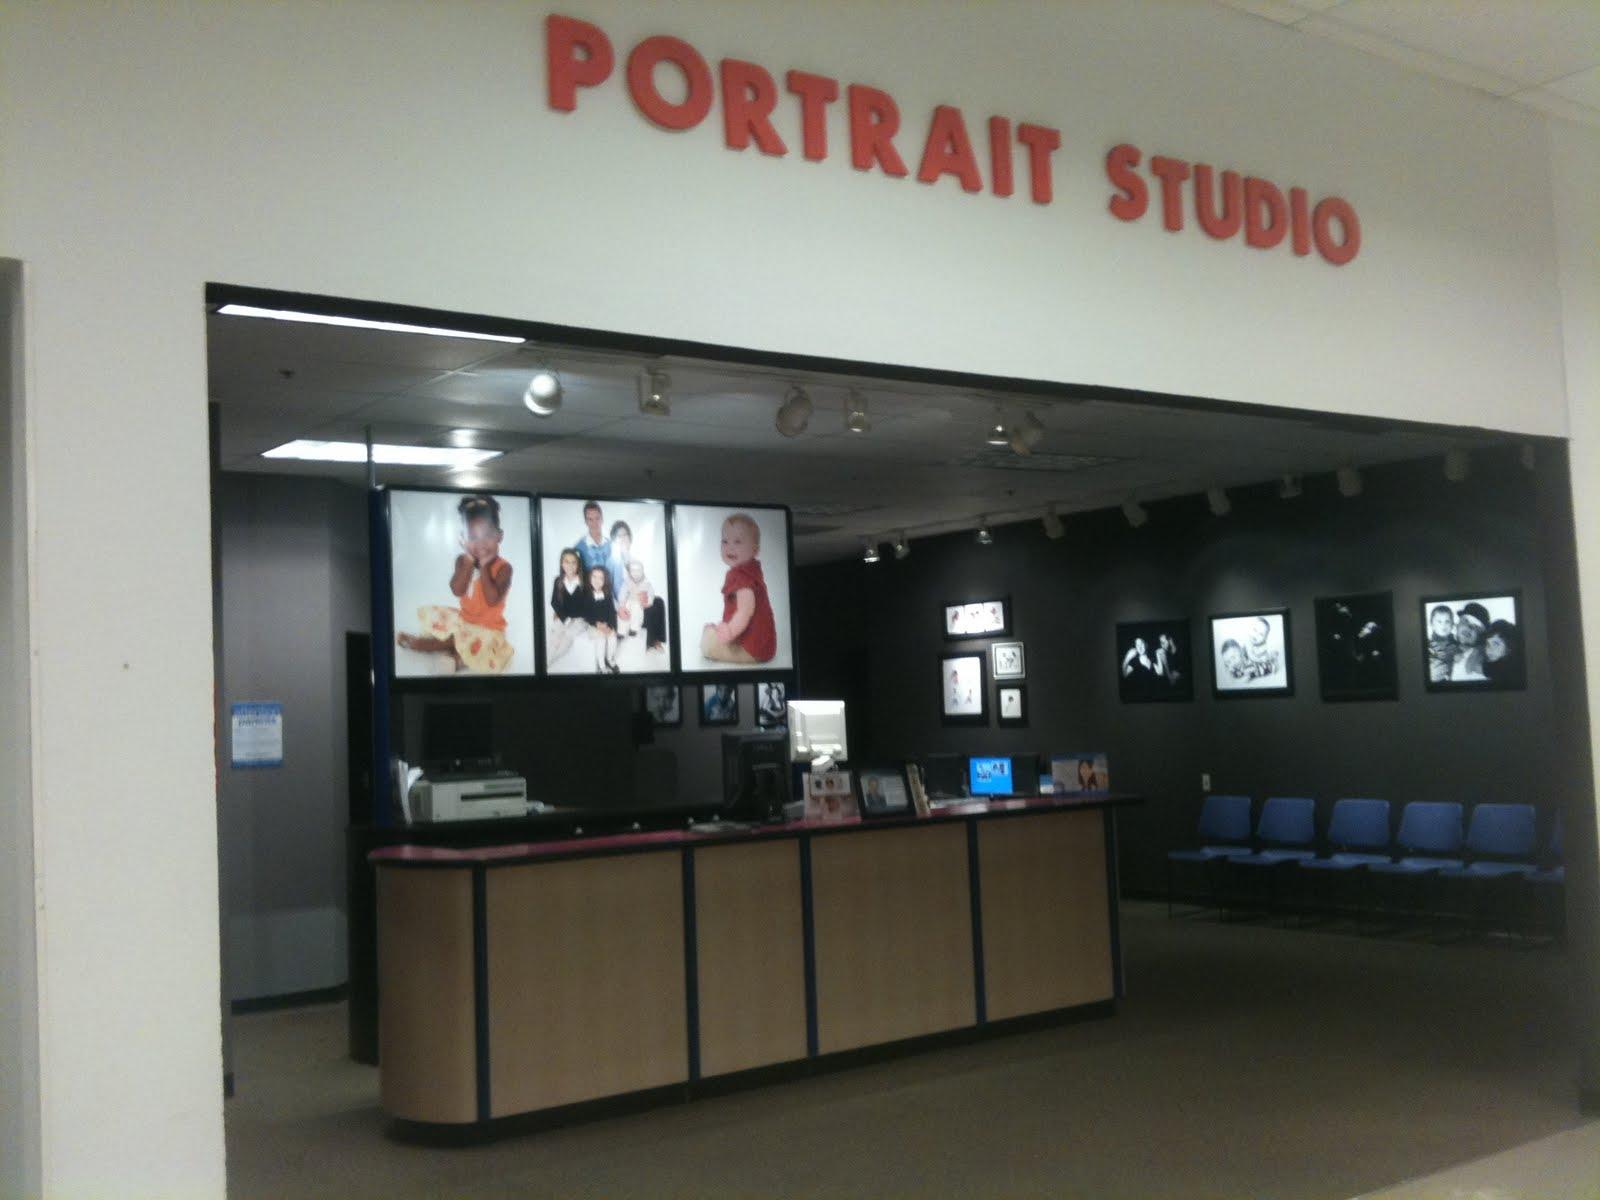 Sears portrait studio merle hay mall for 1212 salon asheboro north carolina